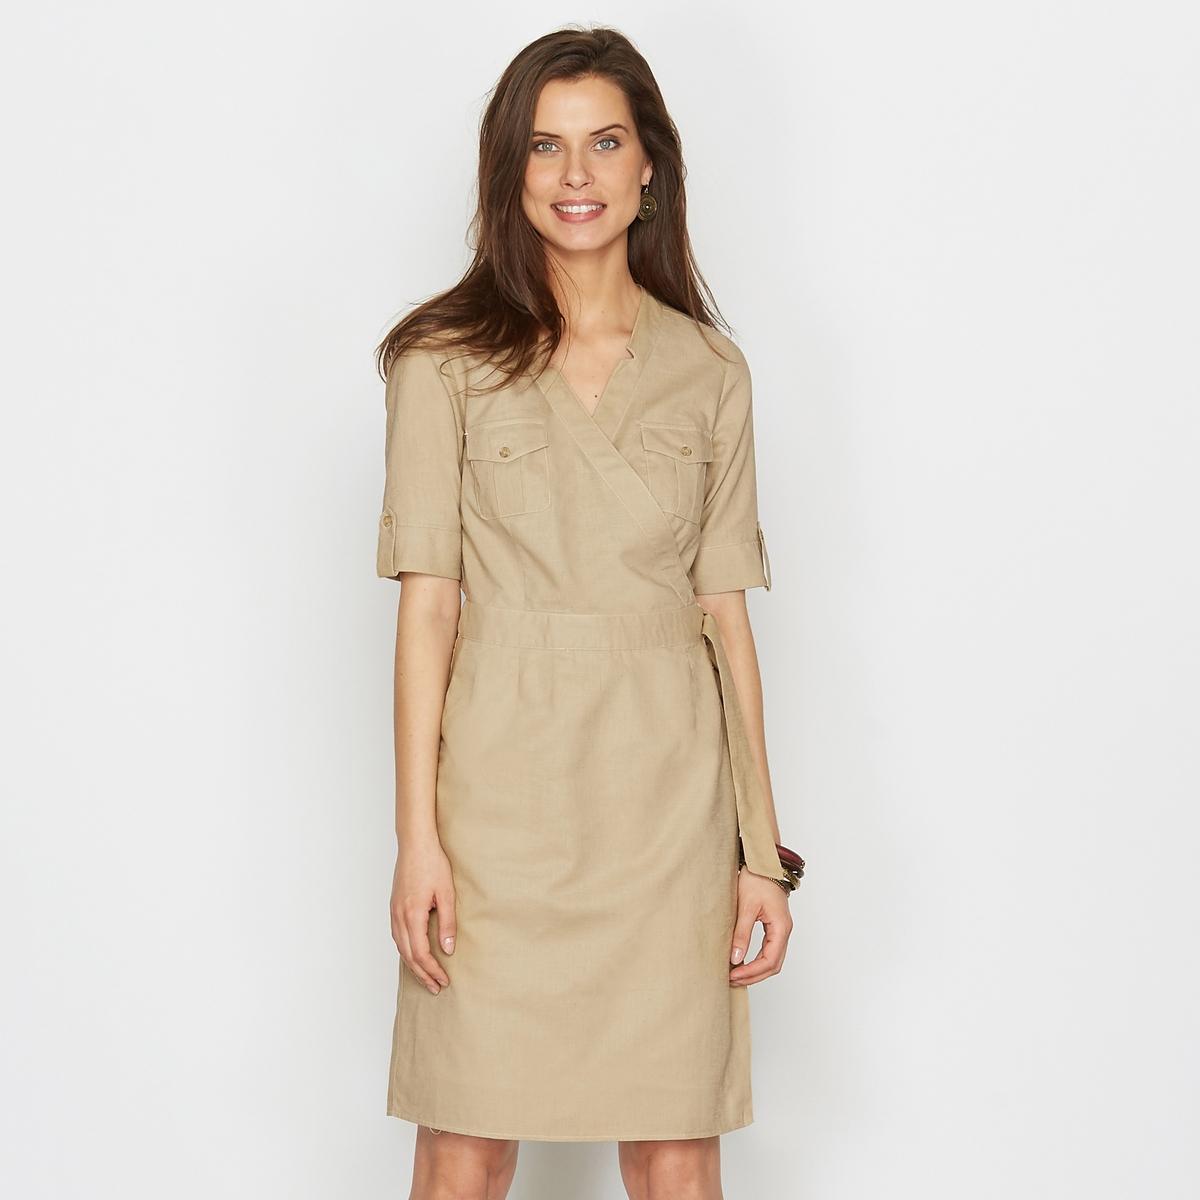 Платье с преобладанием льнаЭластичная, натуральная красивая ткань 55% льна, 45% хлопка .<br><br>Цвет: бежевый<br>Размер: 42 (FR) - 48 (RUS).44 (FR) - 50 (RUS).48 (FR) - 54 (RUS)